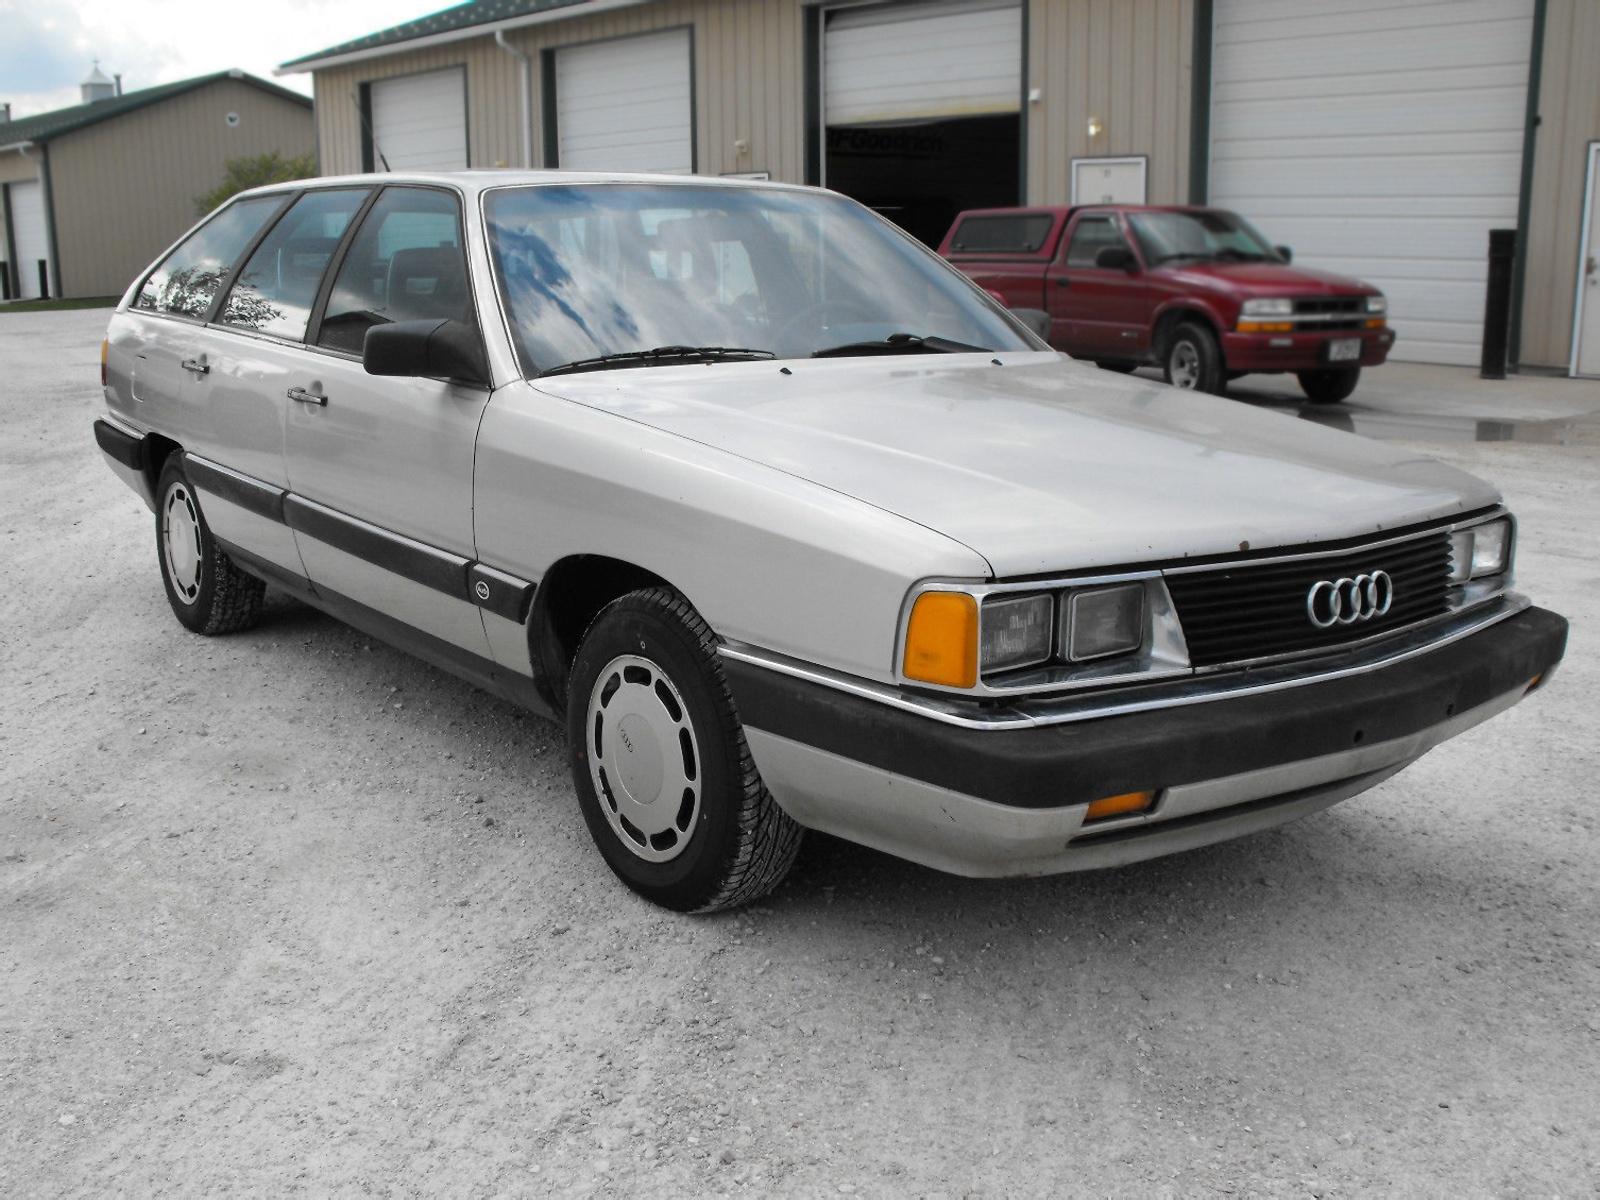 5-Sd Wagon: 1985 Audi 5000 S